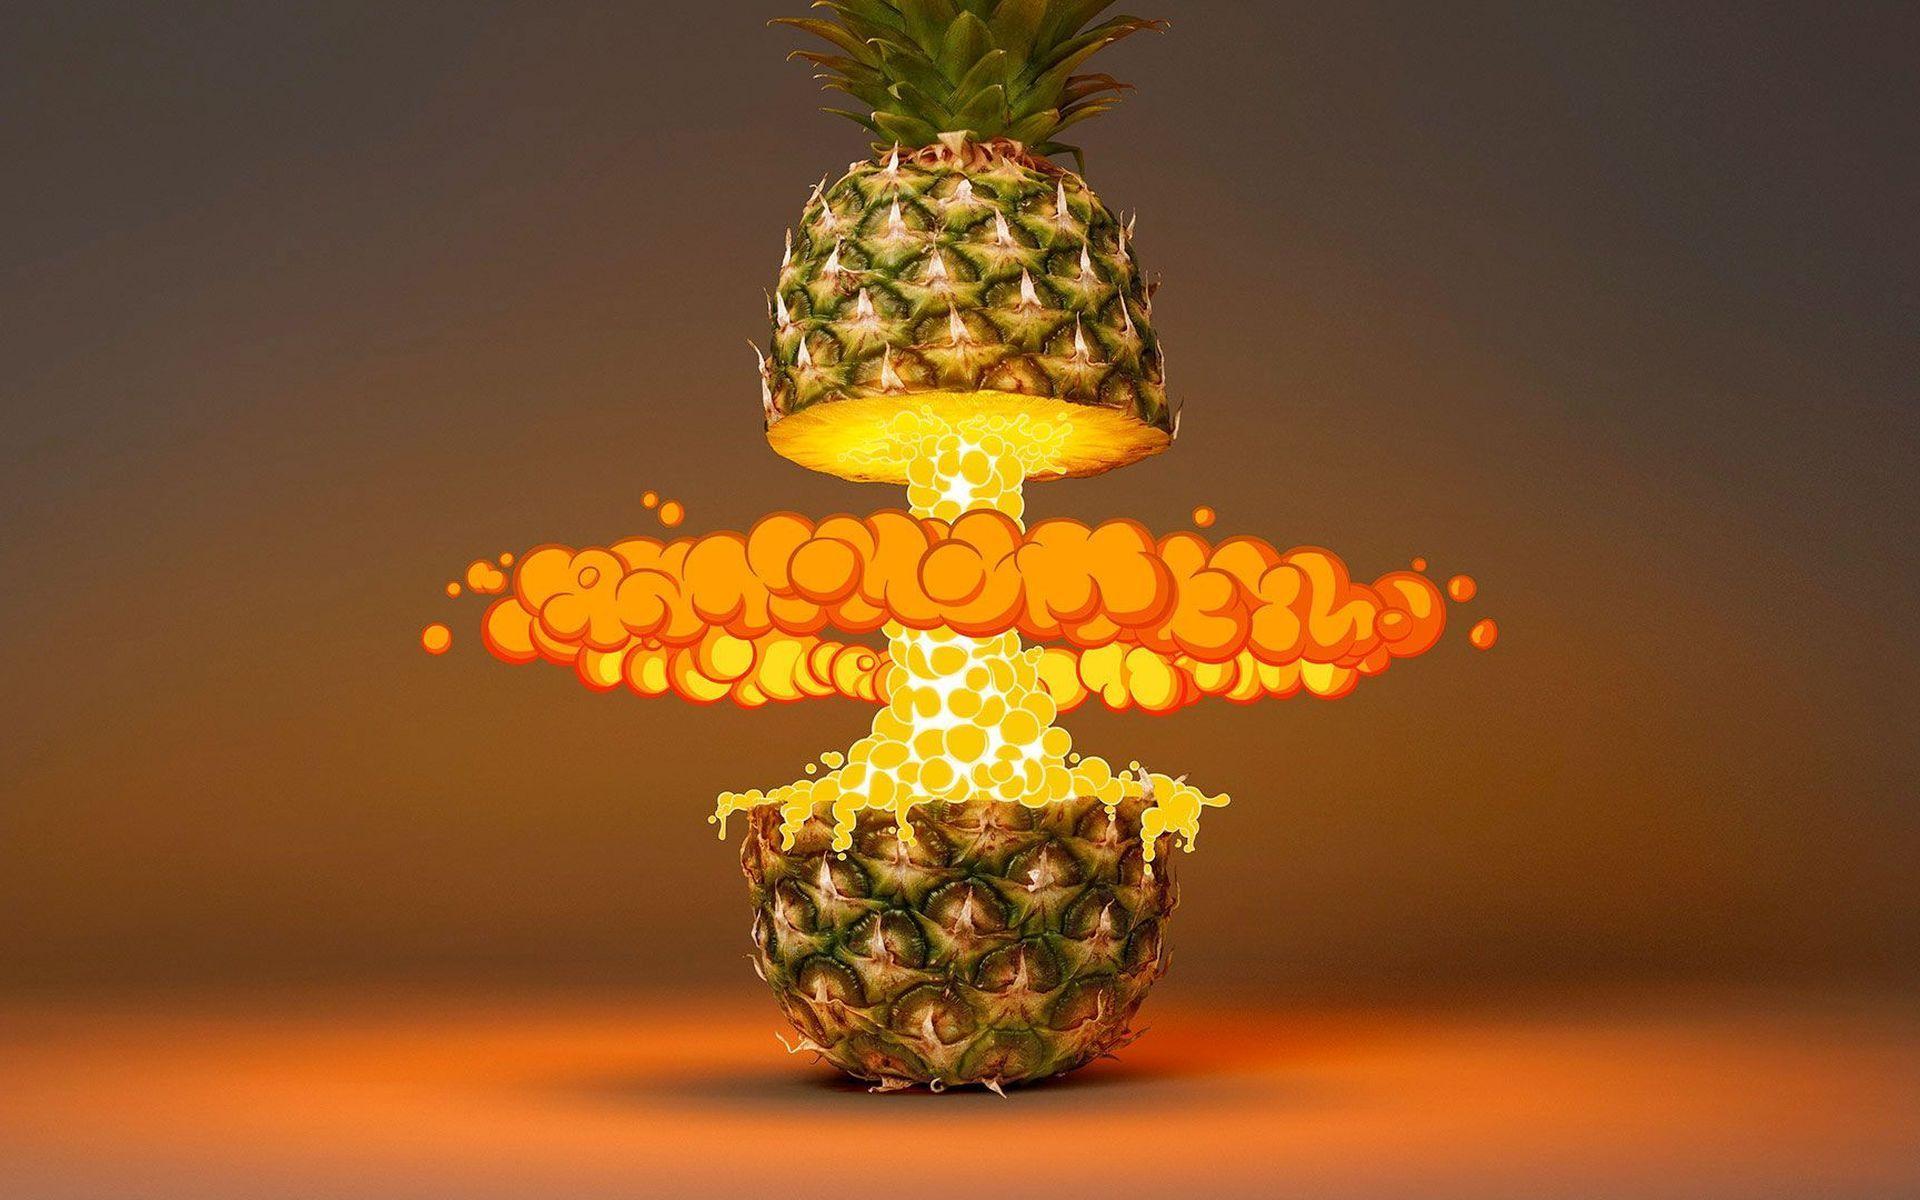 pineapple desktop wallpaper - photo #21